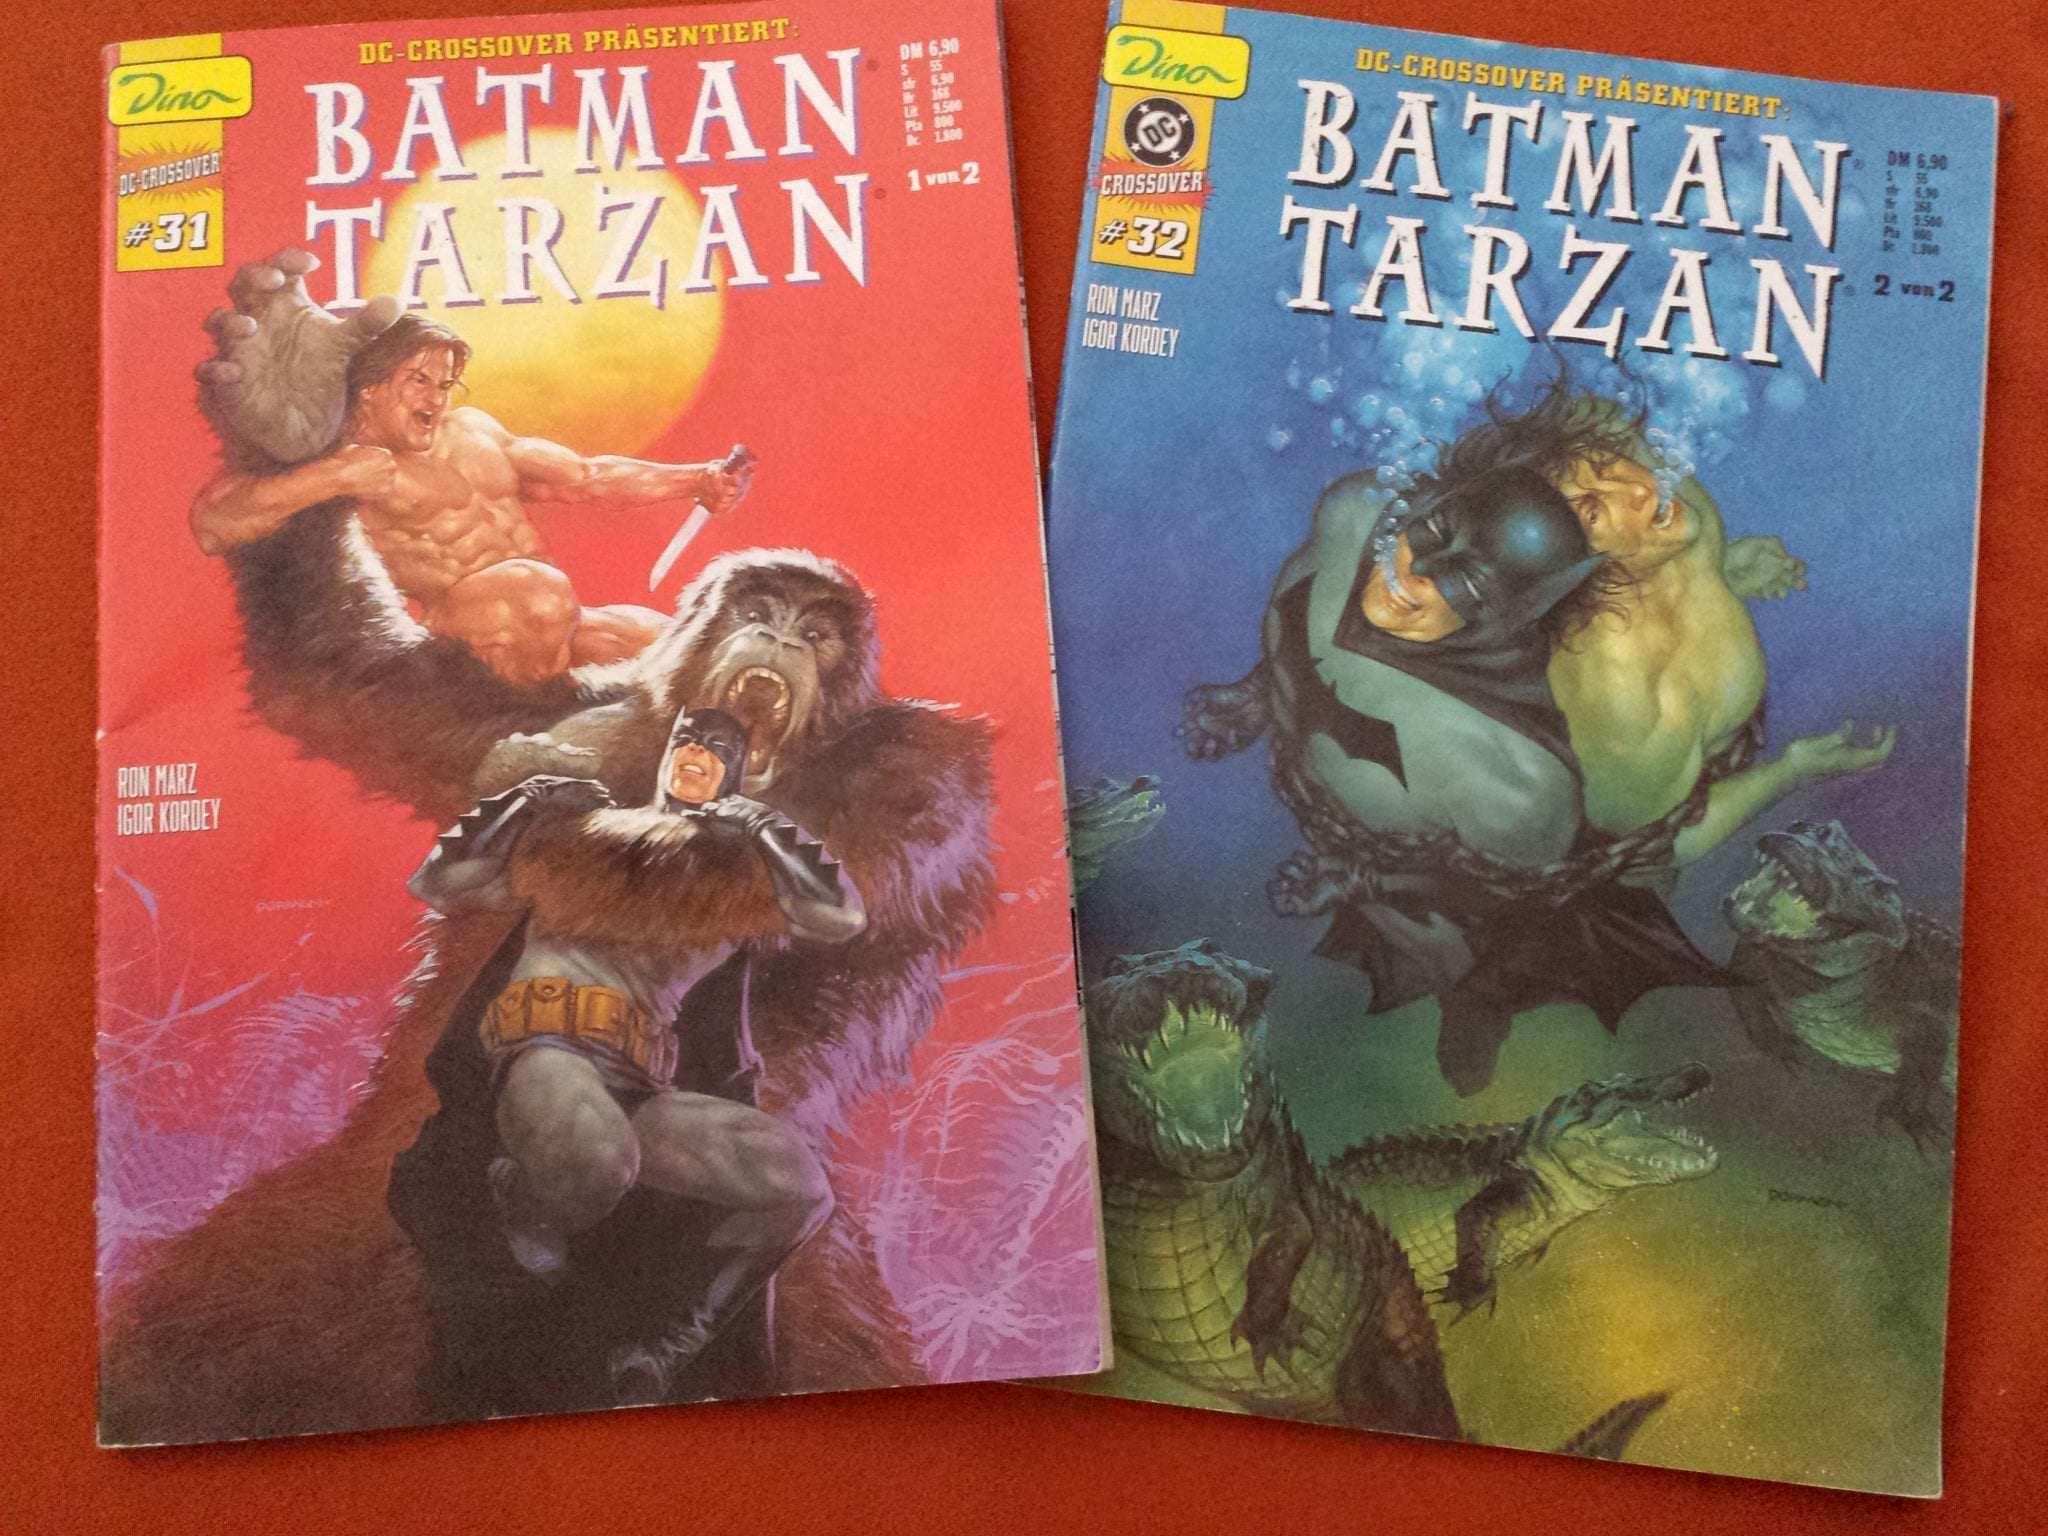 DC-Crossover | Die phänomenale Saga mit Batman & Tarzan